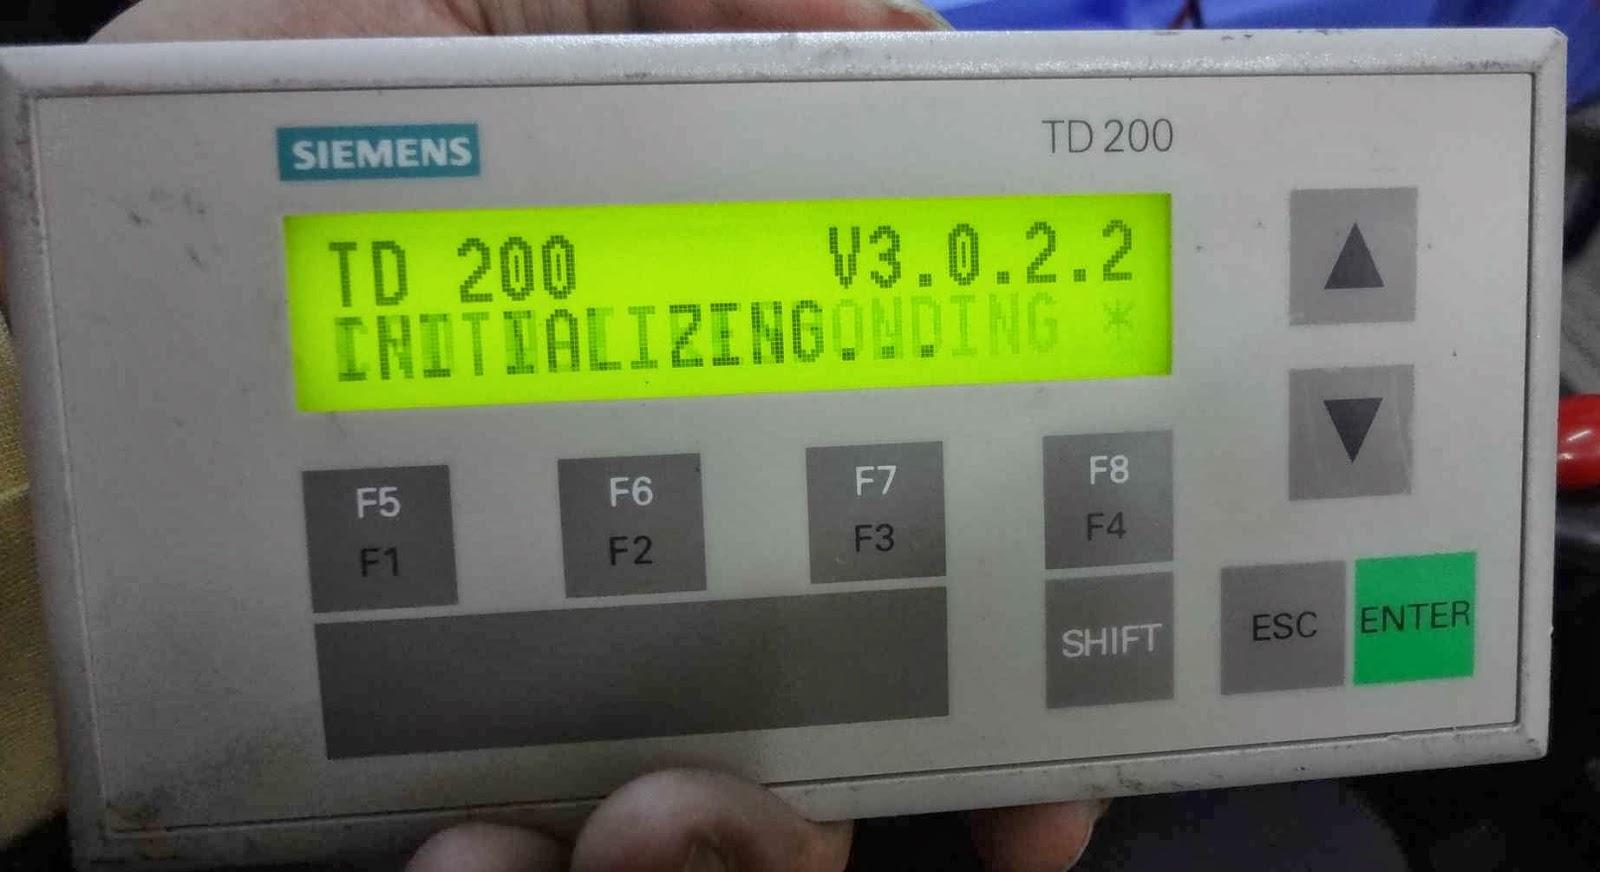 Ebay id flukel store blog siemens td200 simatic s7 td200 siemens td200 simatic s7 td200 6es7272 0aa30 0ya1 user control panel sciox Choice Image